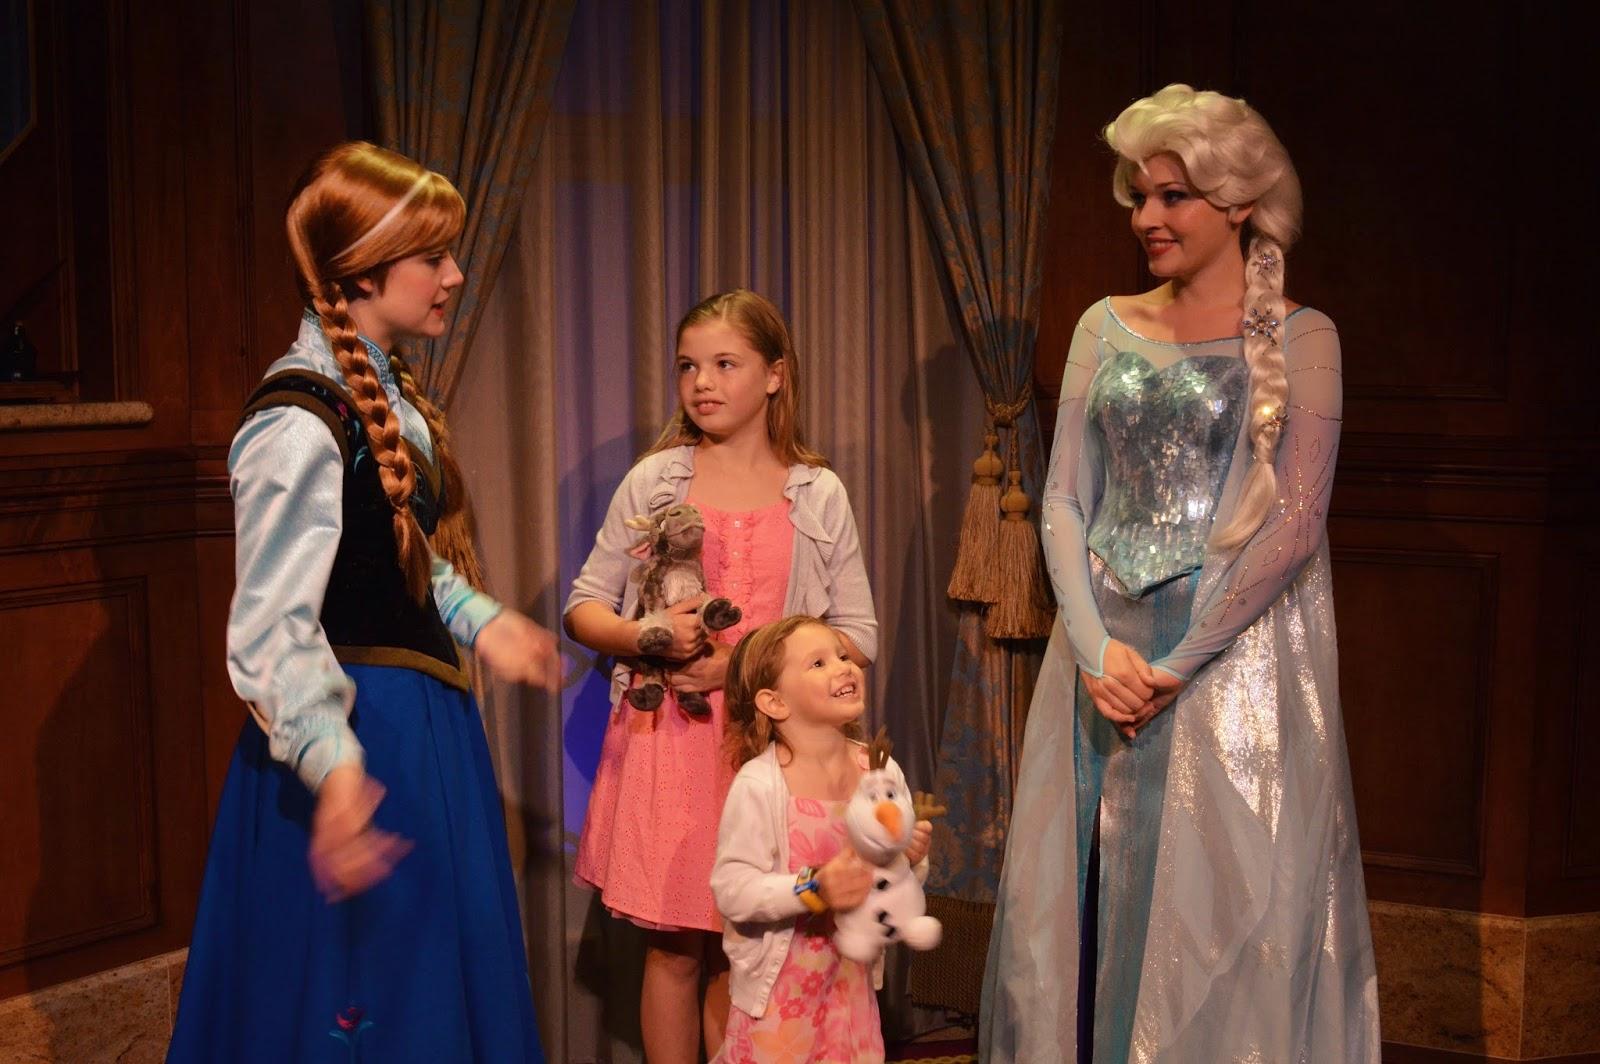 meet anna and elsa magic kingdom